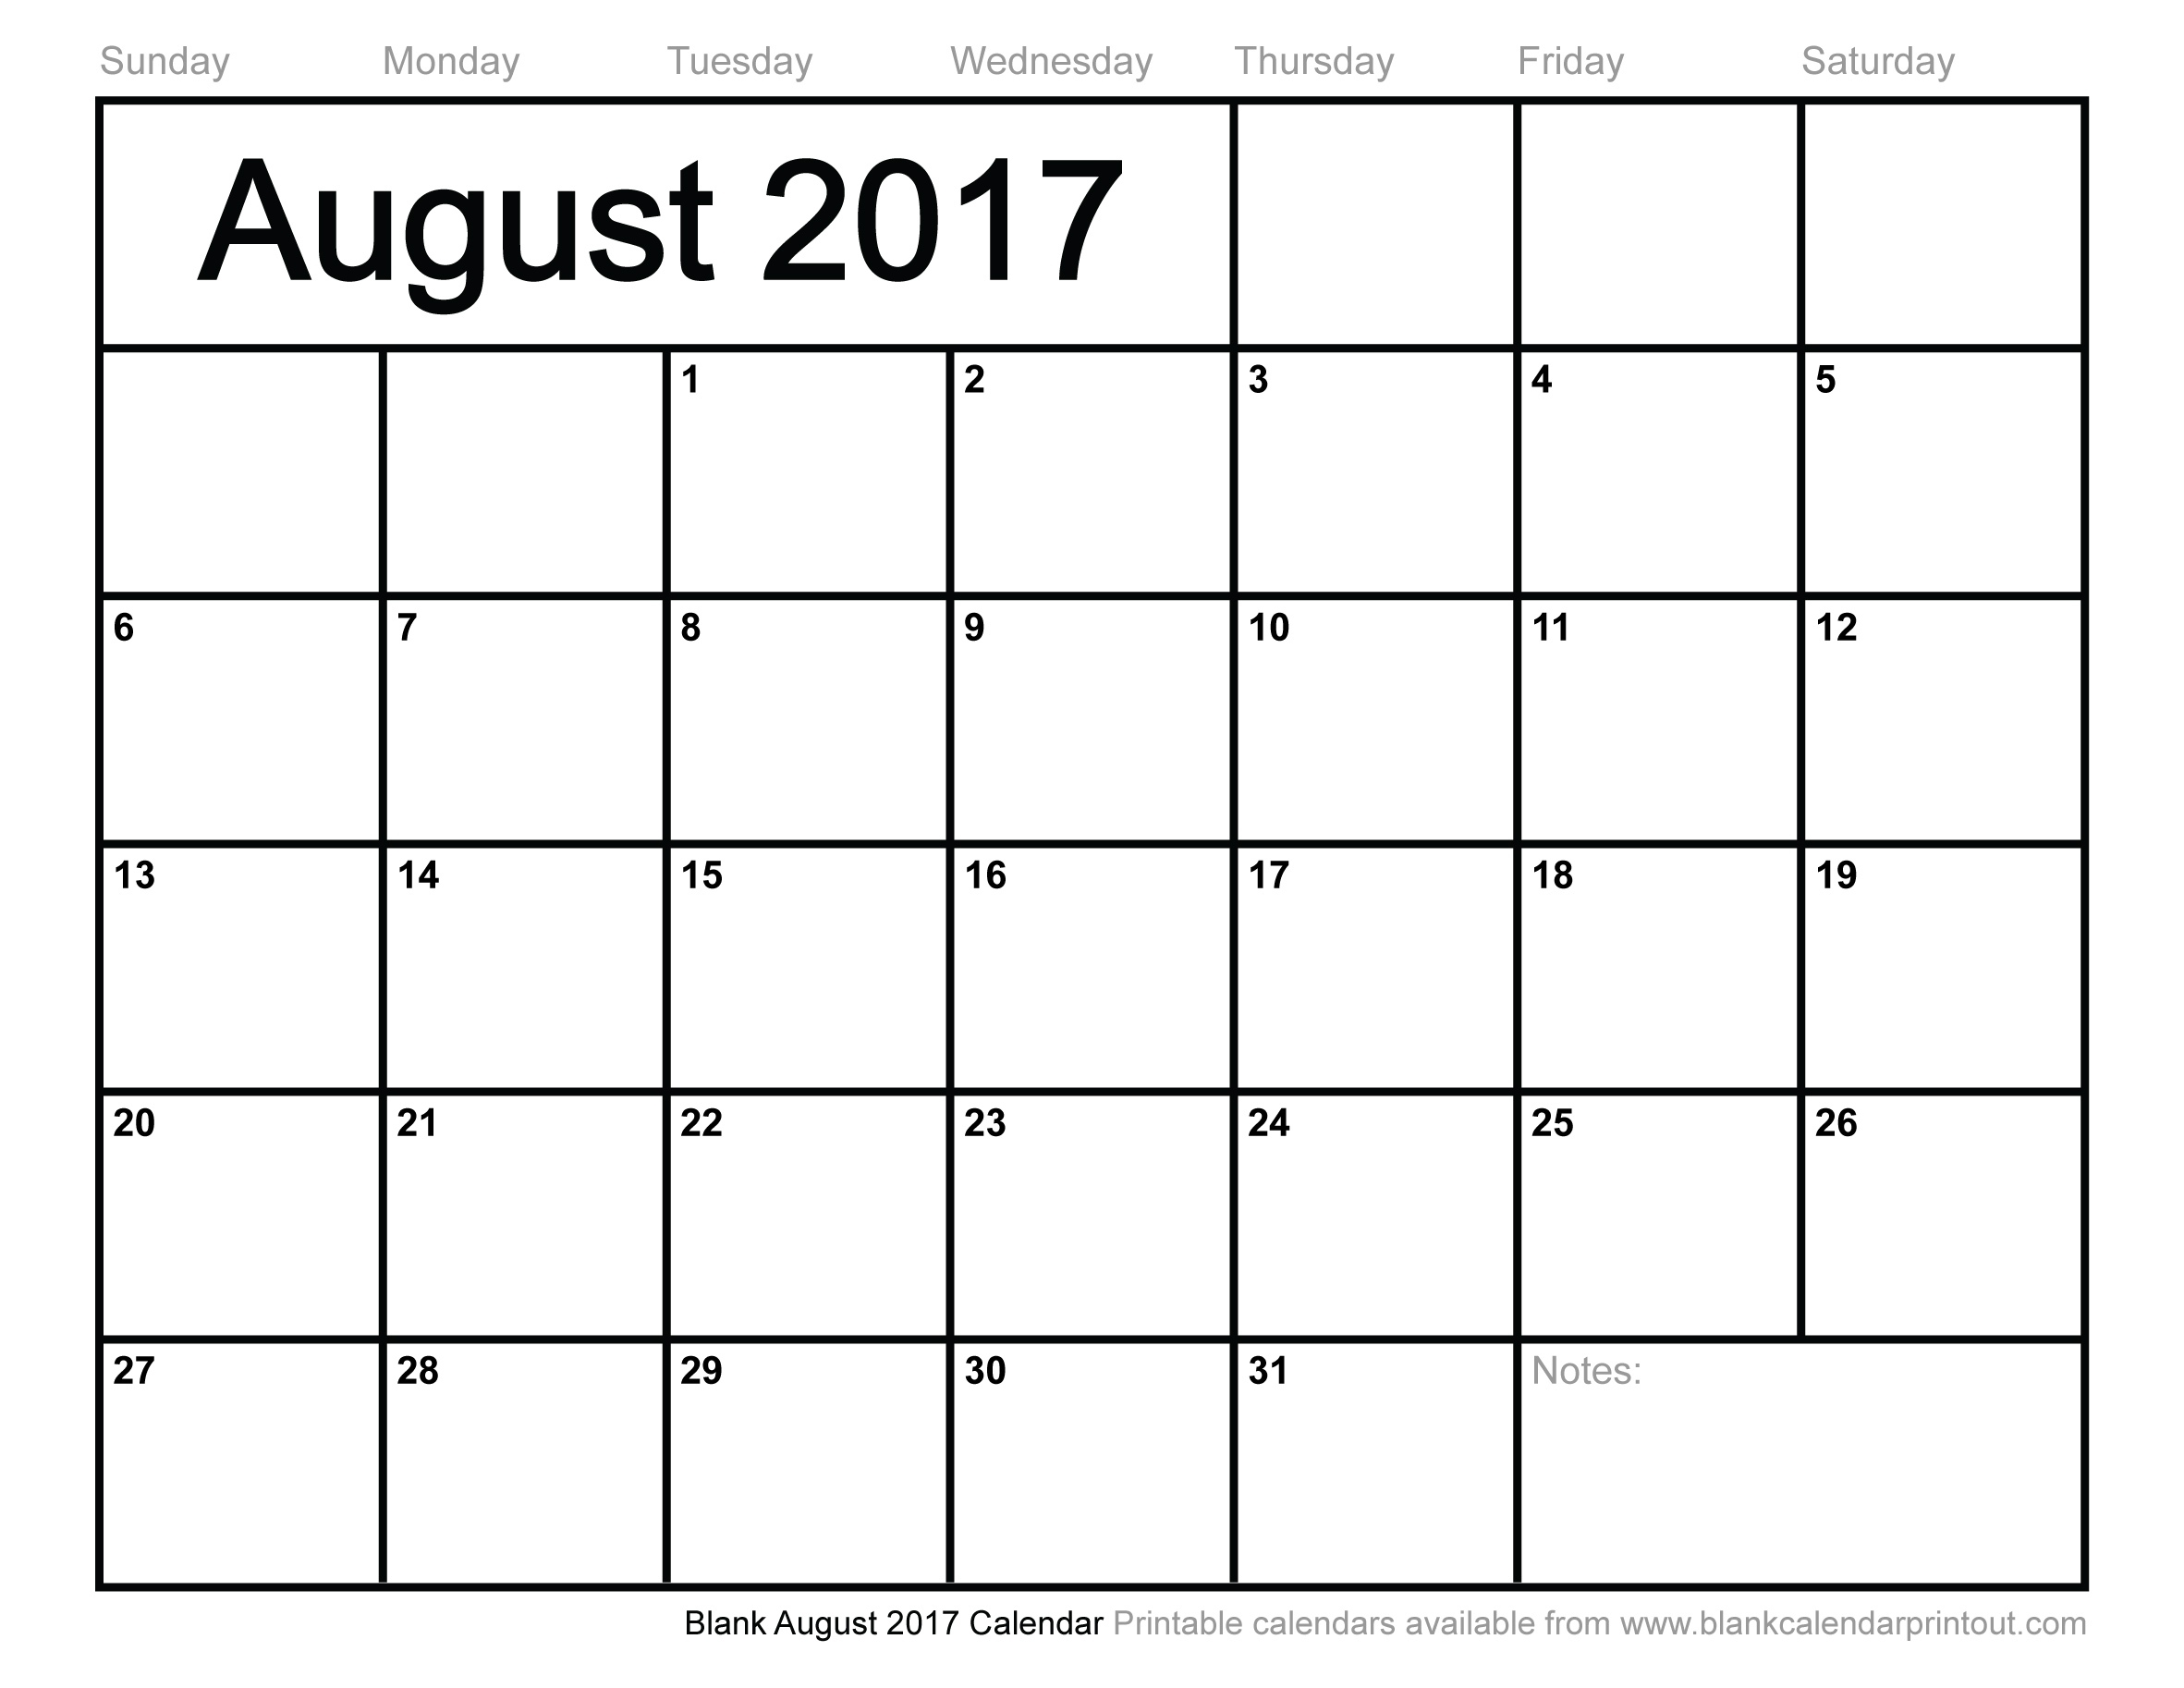 Blank August 2017 Calendar To Print Calendar Blank To Print